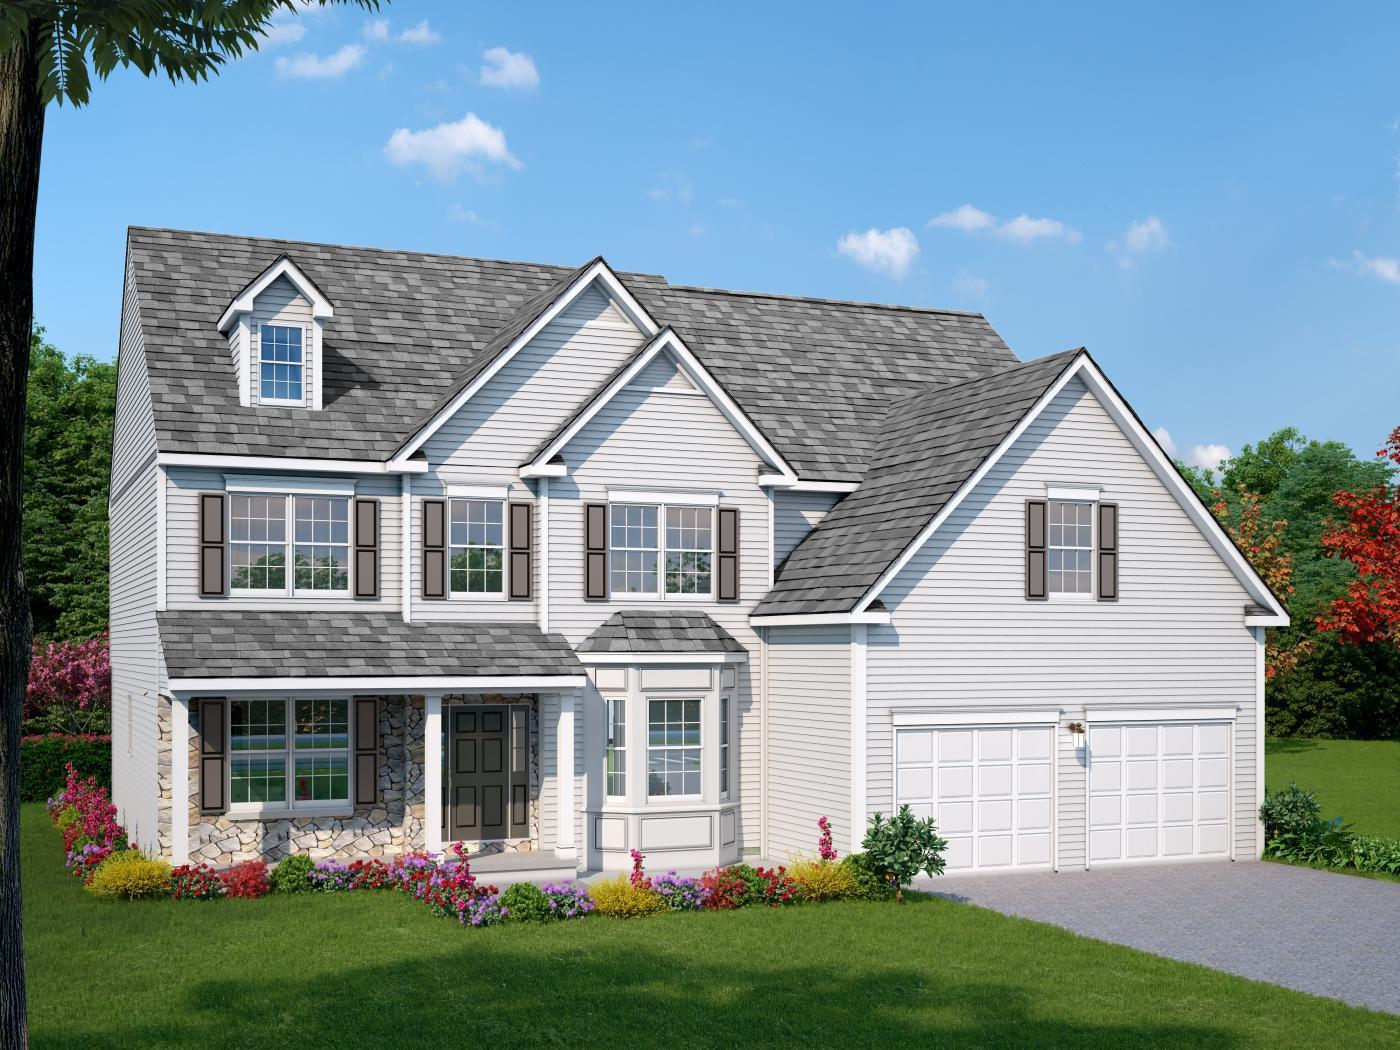 Single Family for Sale at Maple Shade Estates (Bethlehem Twp) - Breckenridge Traditional 3796 Bethman Rd. Easton, Pennsylvania 18045 United States